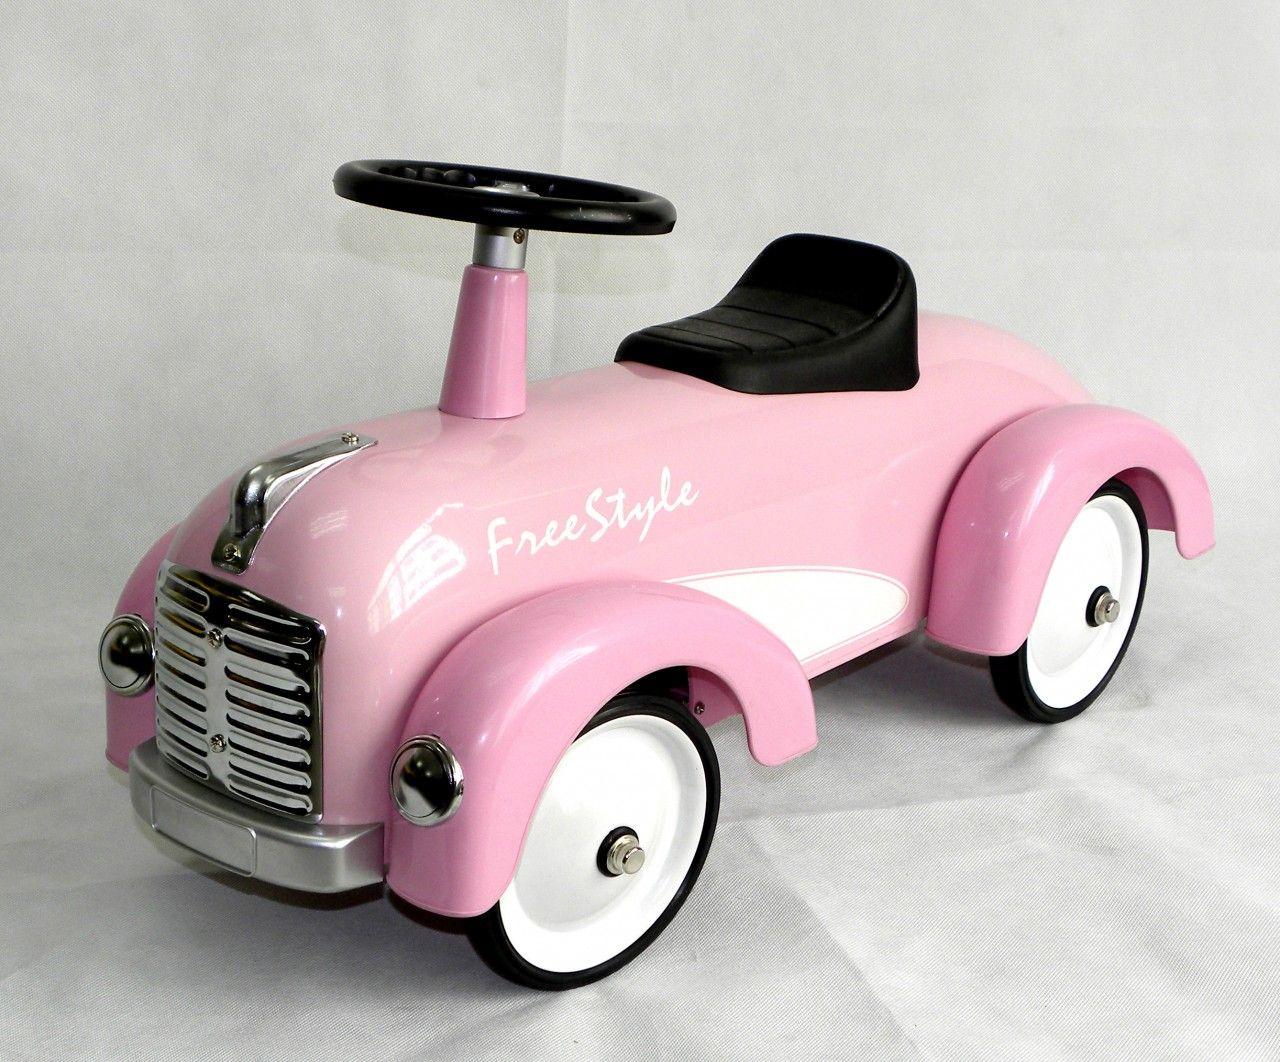 Baby girl car toys  Pink Speedster Freestyle  PINK PINK PINK  Pinterest